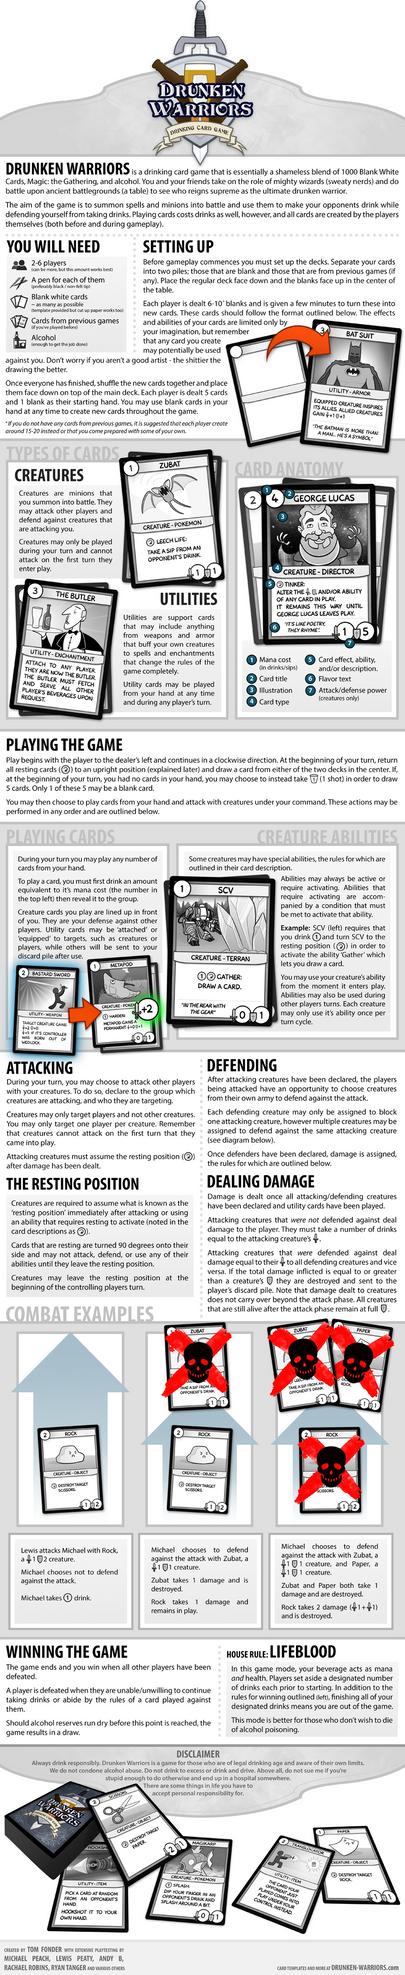 Drunken Warriors - A Drinking Card Game